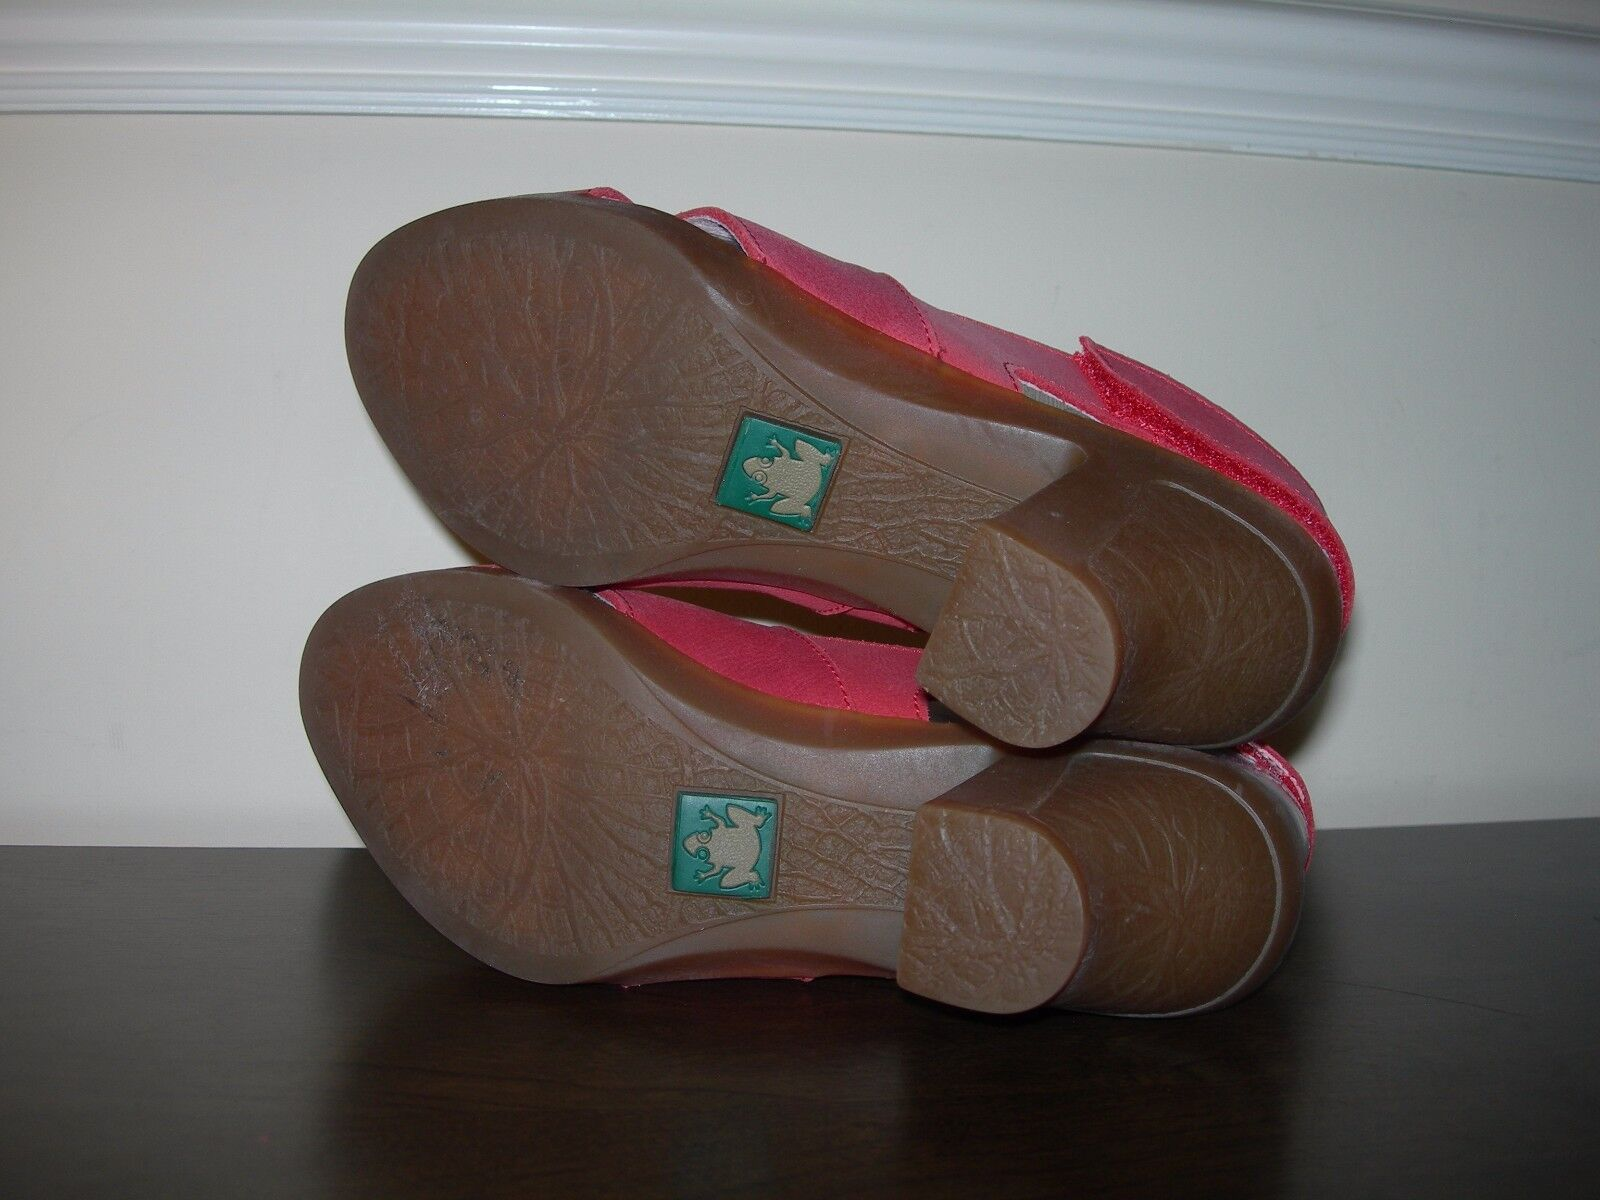 EL NATURALISTA WOMEN'S Schuhe SANDALS SLINGBACKS 37 PALE ROT LEATHER EU 37 SLINGBACKS / UK 4 a0c5dc